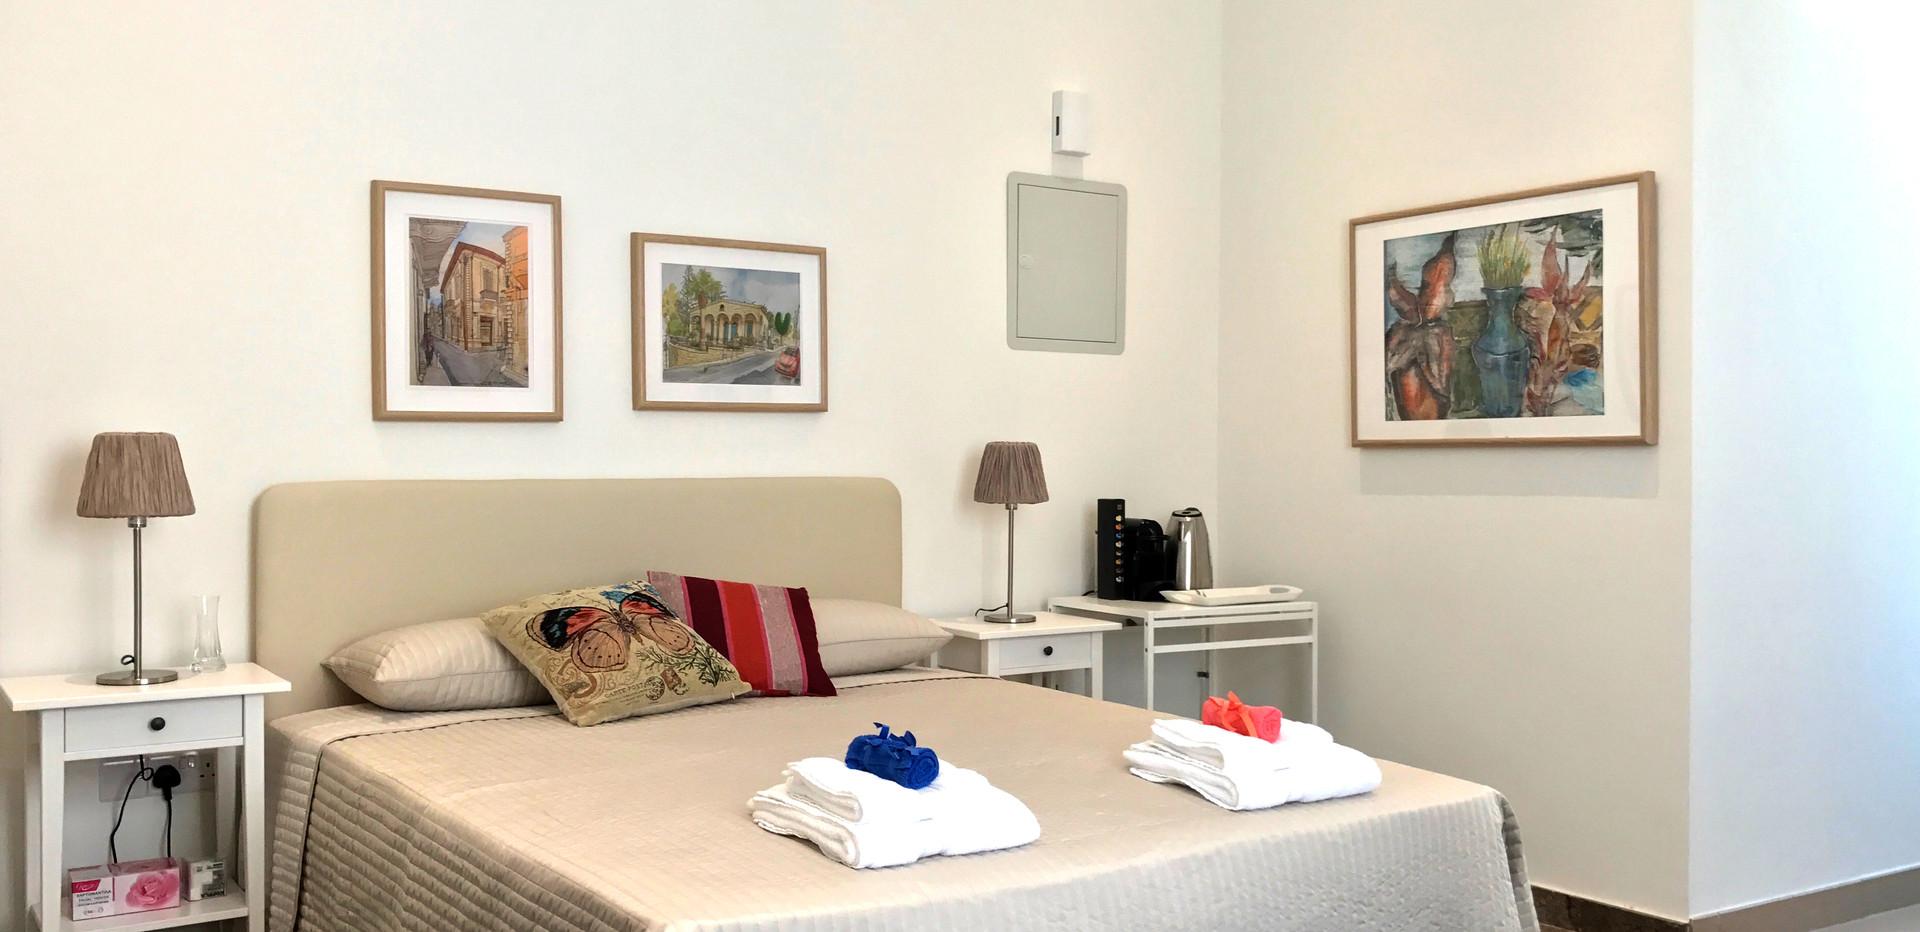 CAROB STUDIO INSIDE accommodation limass